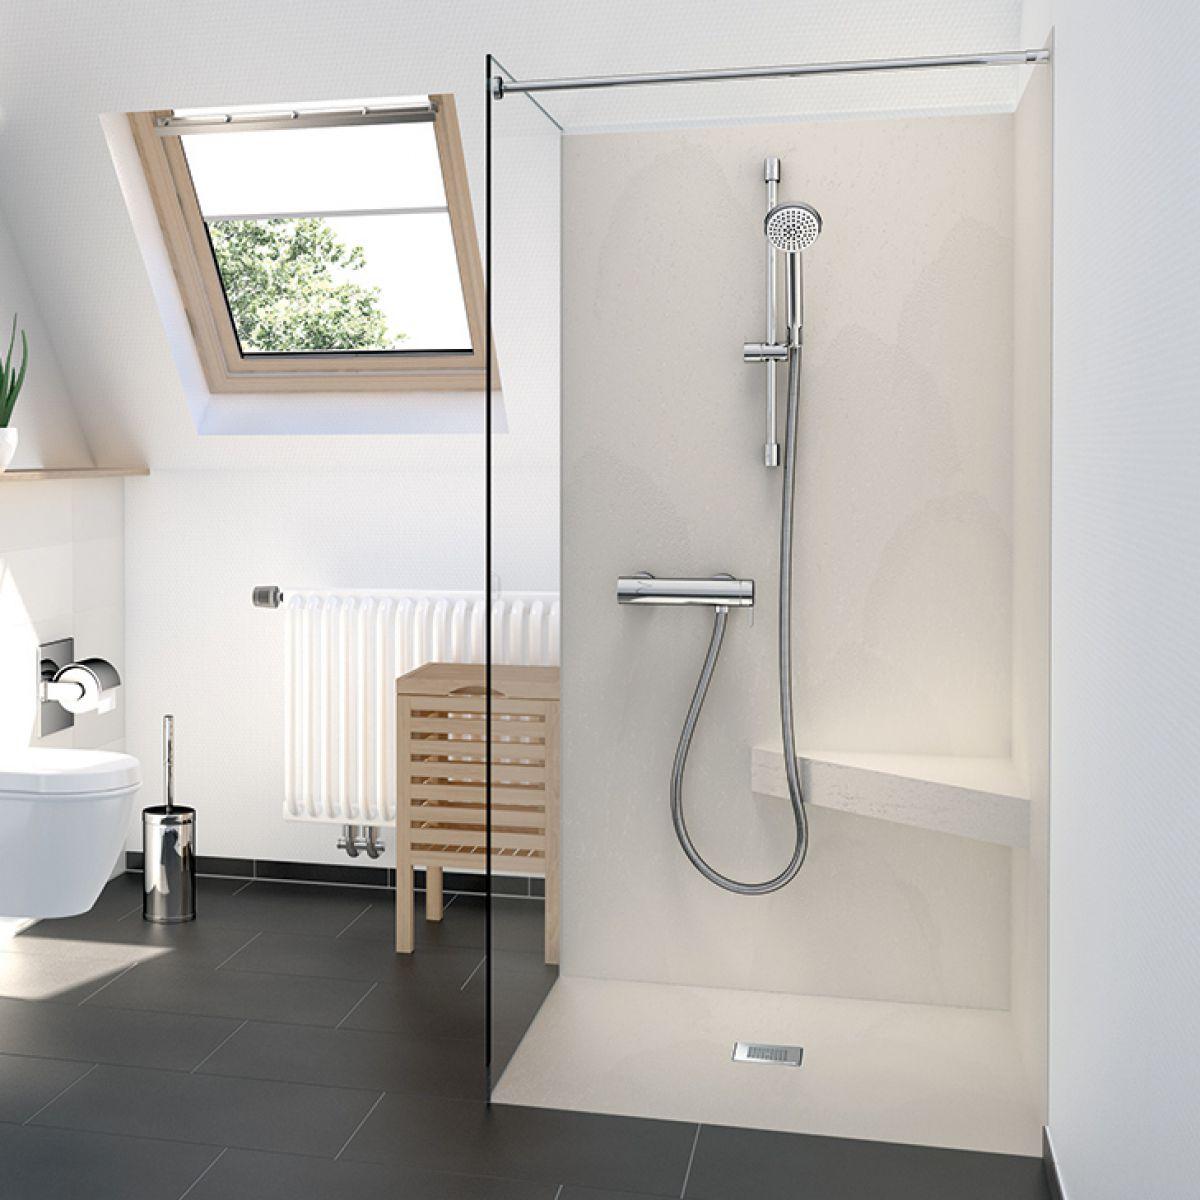 wedi Top Wall Panels - UK Bathrooms